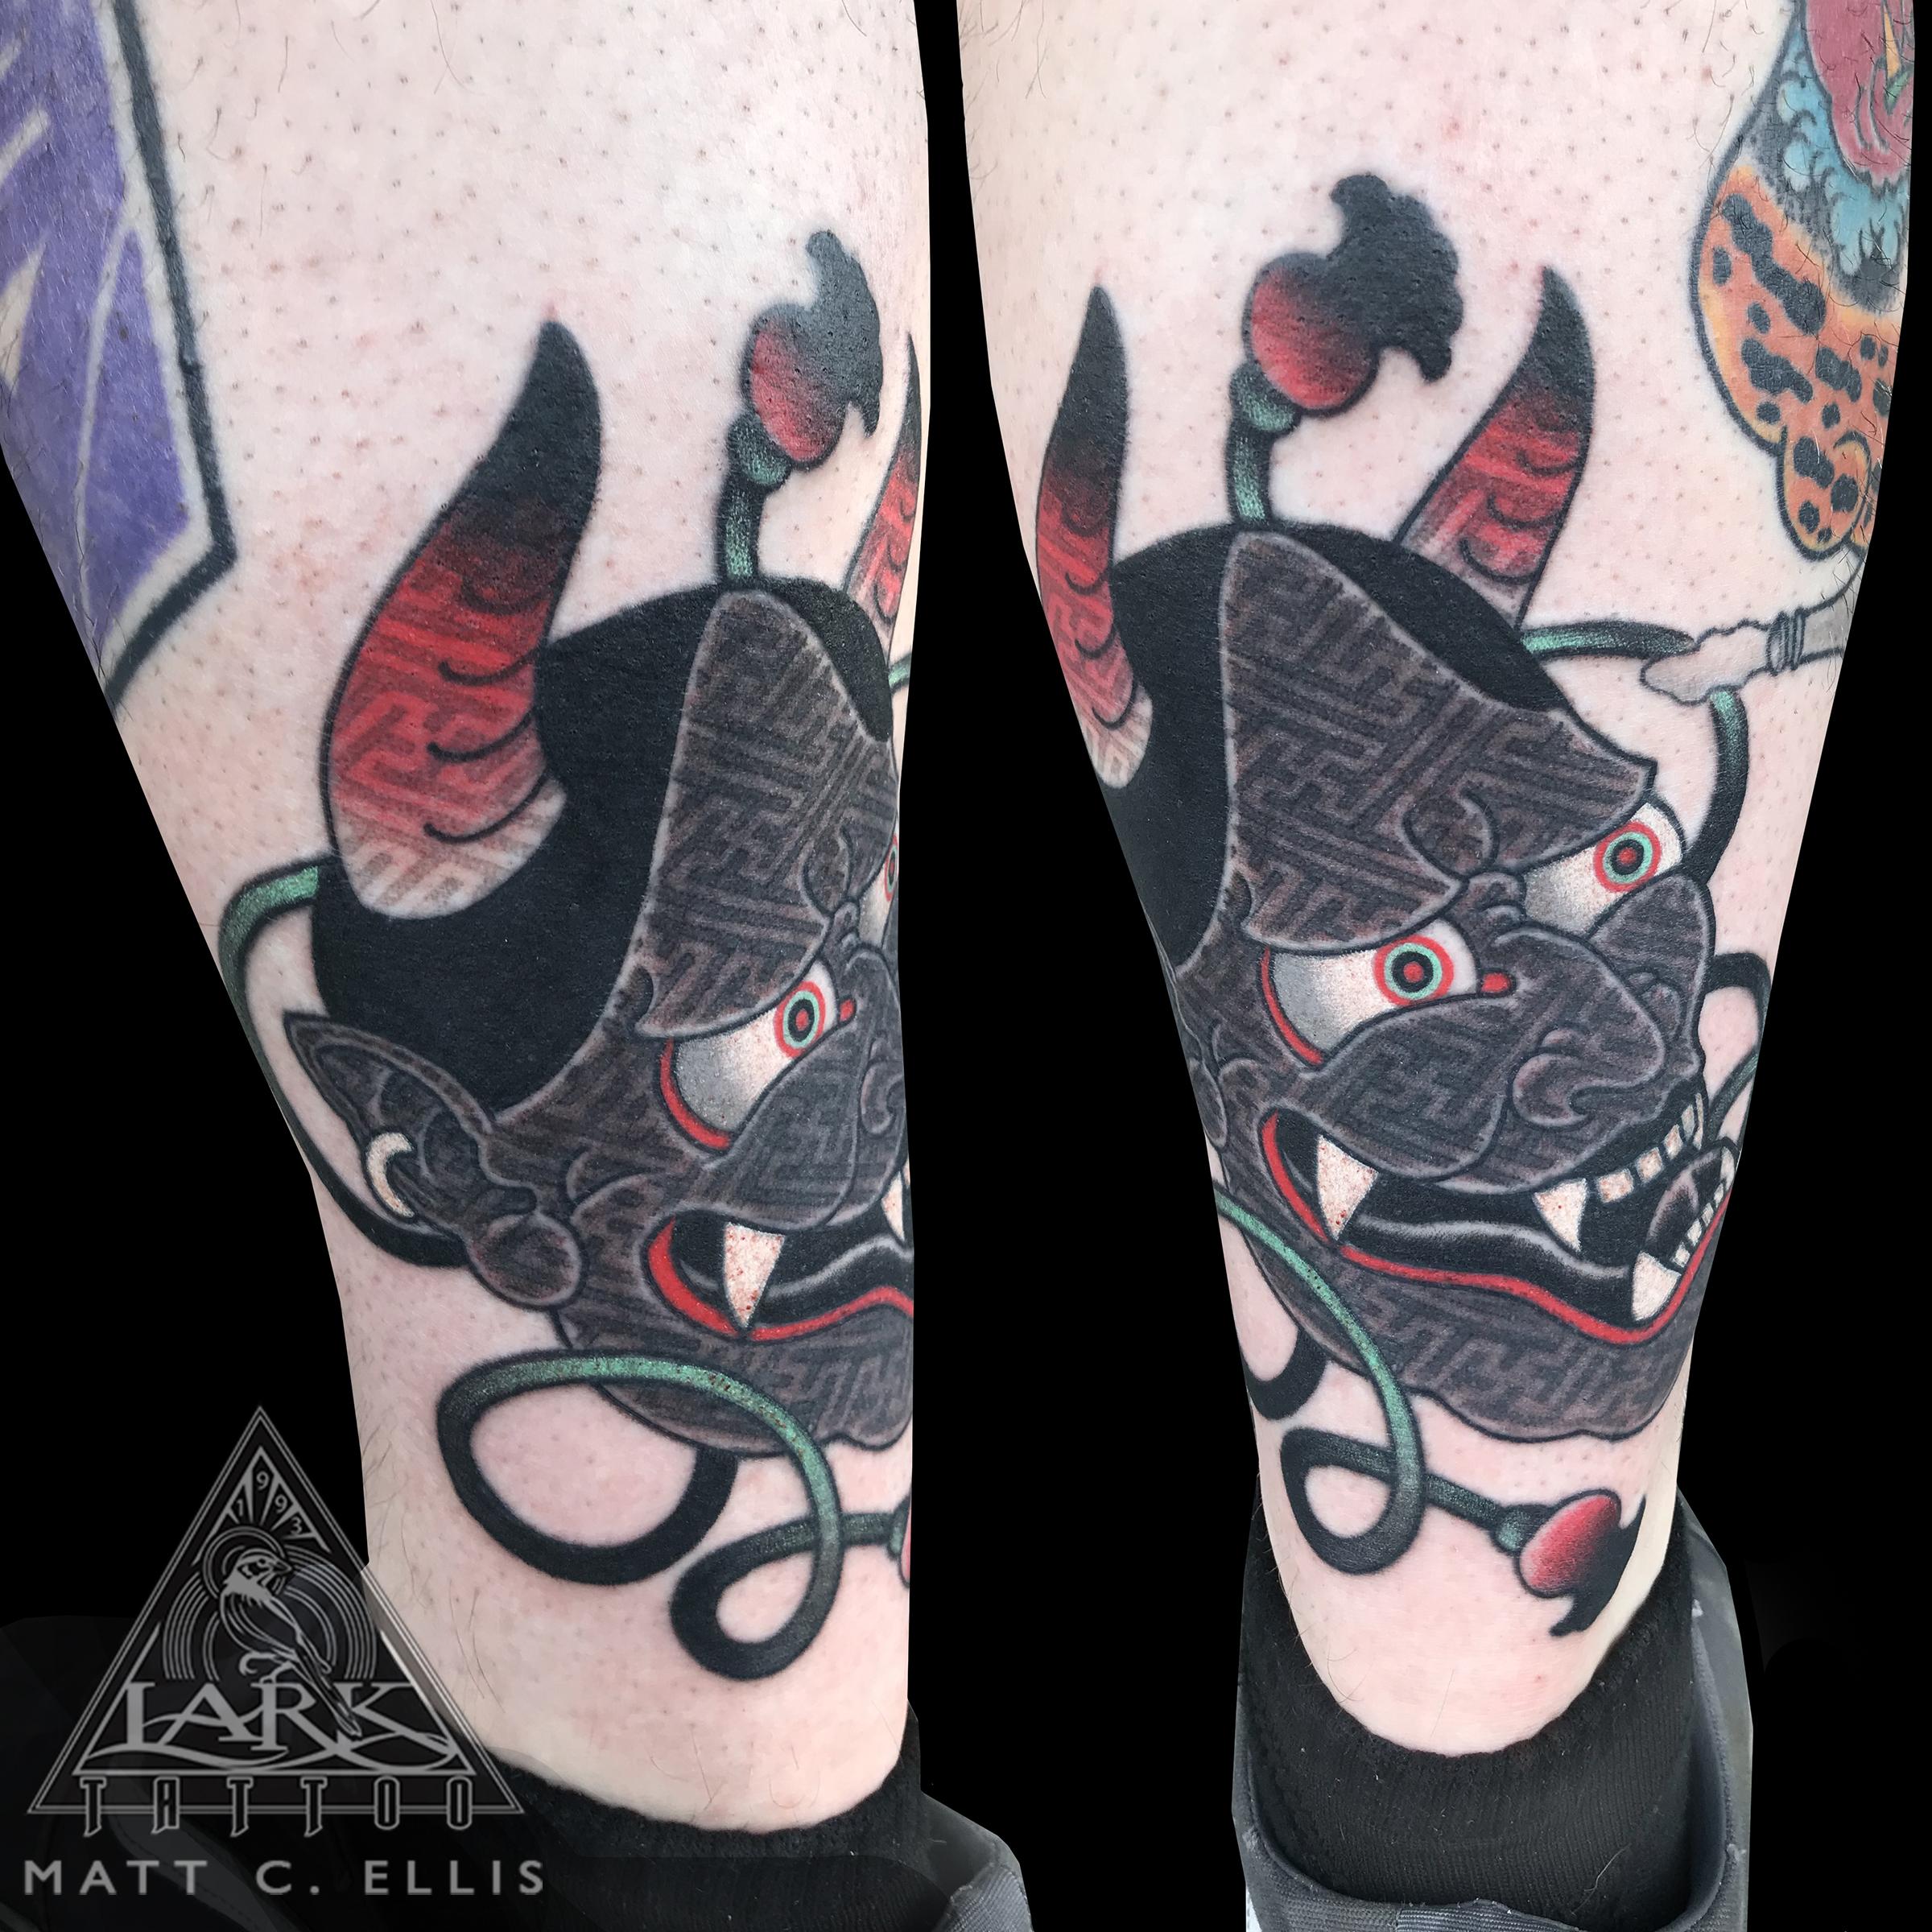 #colortattoo #Japanese #Japanesetattoo #oni #onitattoo #onimask #onimasktattoo #devil #deviltattoo #devilmask #devilmasktattoo #Japanesefolklore #Japanesefolkloretattoo #geometric #geometrictattoo #tattoo #tattoos #tat #tats #tatts #tatted #tattedup #tattoist #tattooed #inked #inkedup #ink #tattoooftheday #amazingink #bodyart #tattooig #tattoosofinstagram #instatats #larktattoo #larktattoos #larktattoowestbury #westbury #longisland #NY #NewYork #usa #art